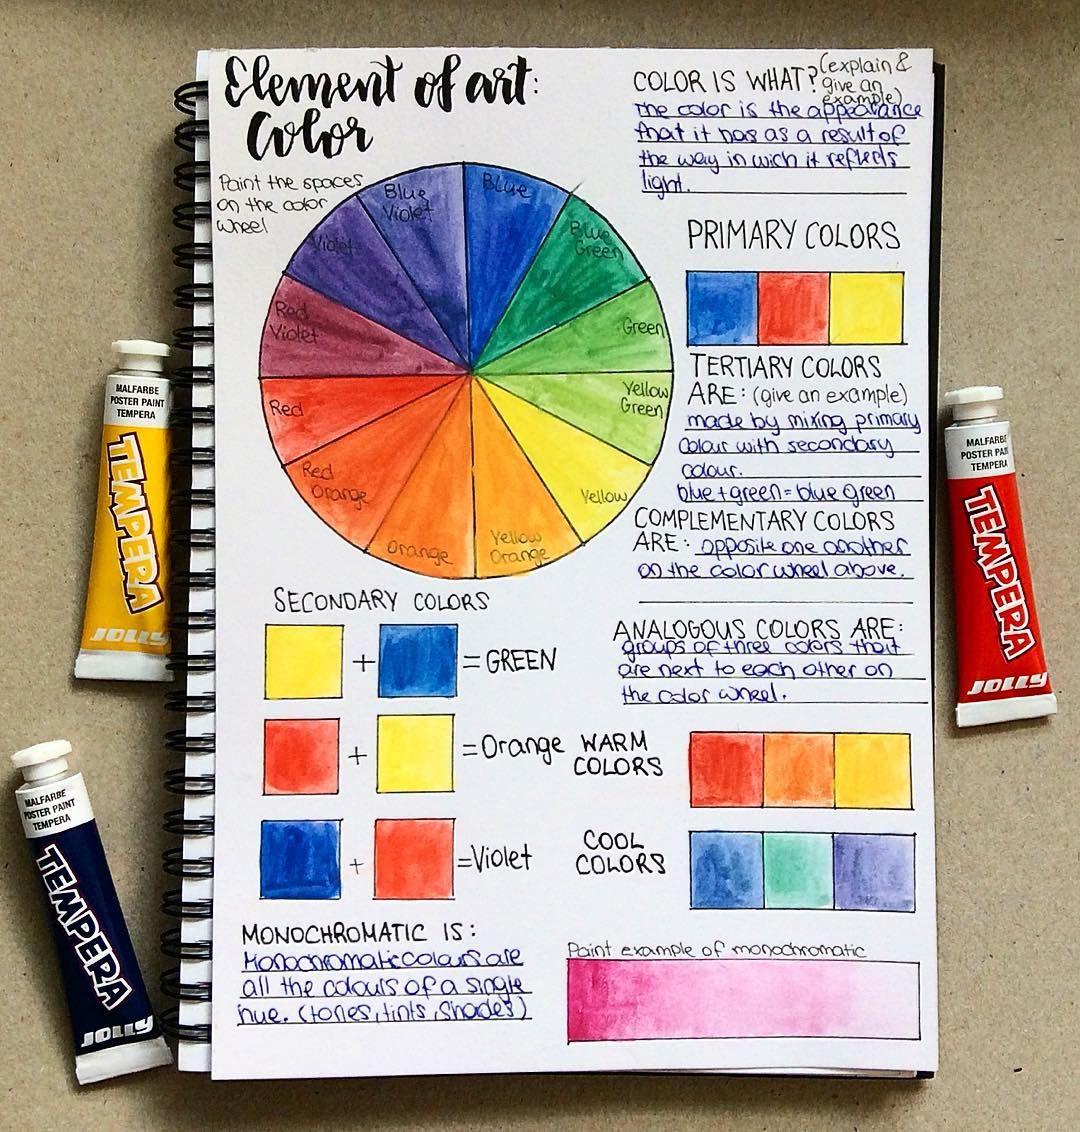 Gefallt 105 Mal 2 Kommentare T A M A R A Acryltastic Auf Instagram Element Of Art Color Elements Of Art Elements Of Art Color Elementary Art Projects [ 1132 x 1080 Pixel ]